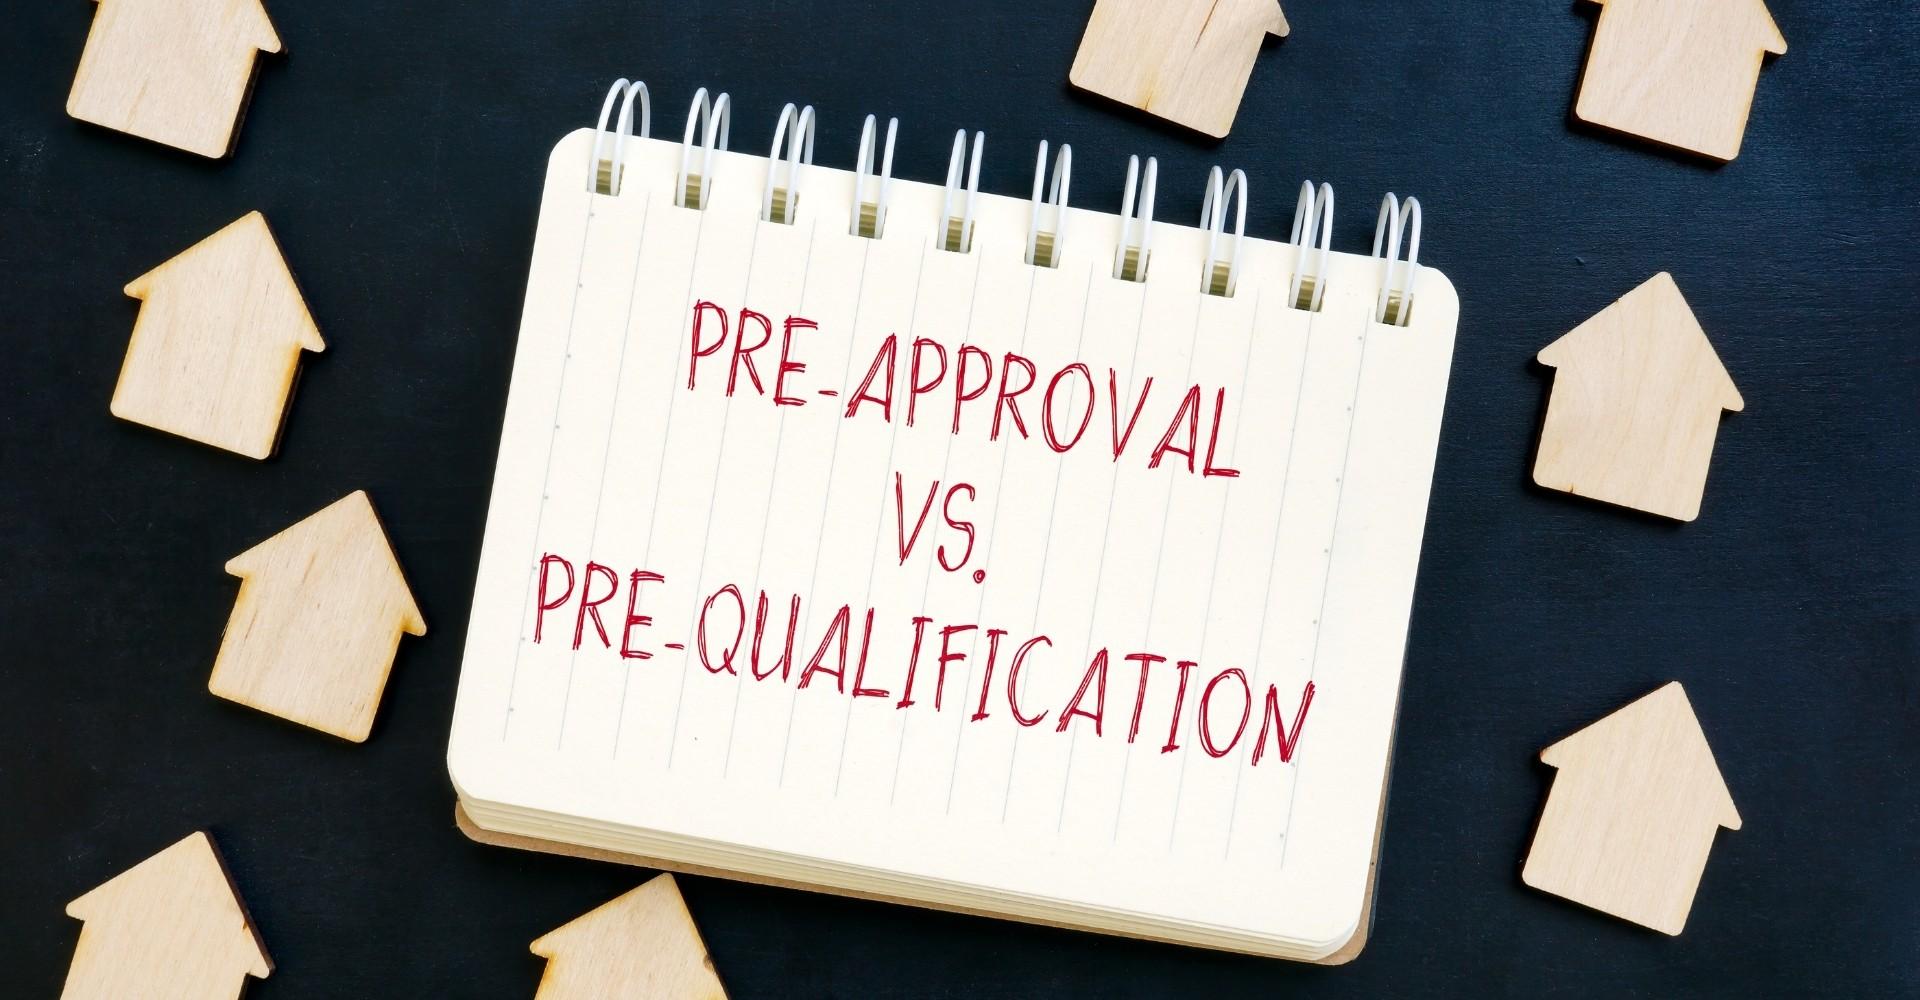 Mortgage Pre-Qualification vs. Pre-Approval